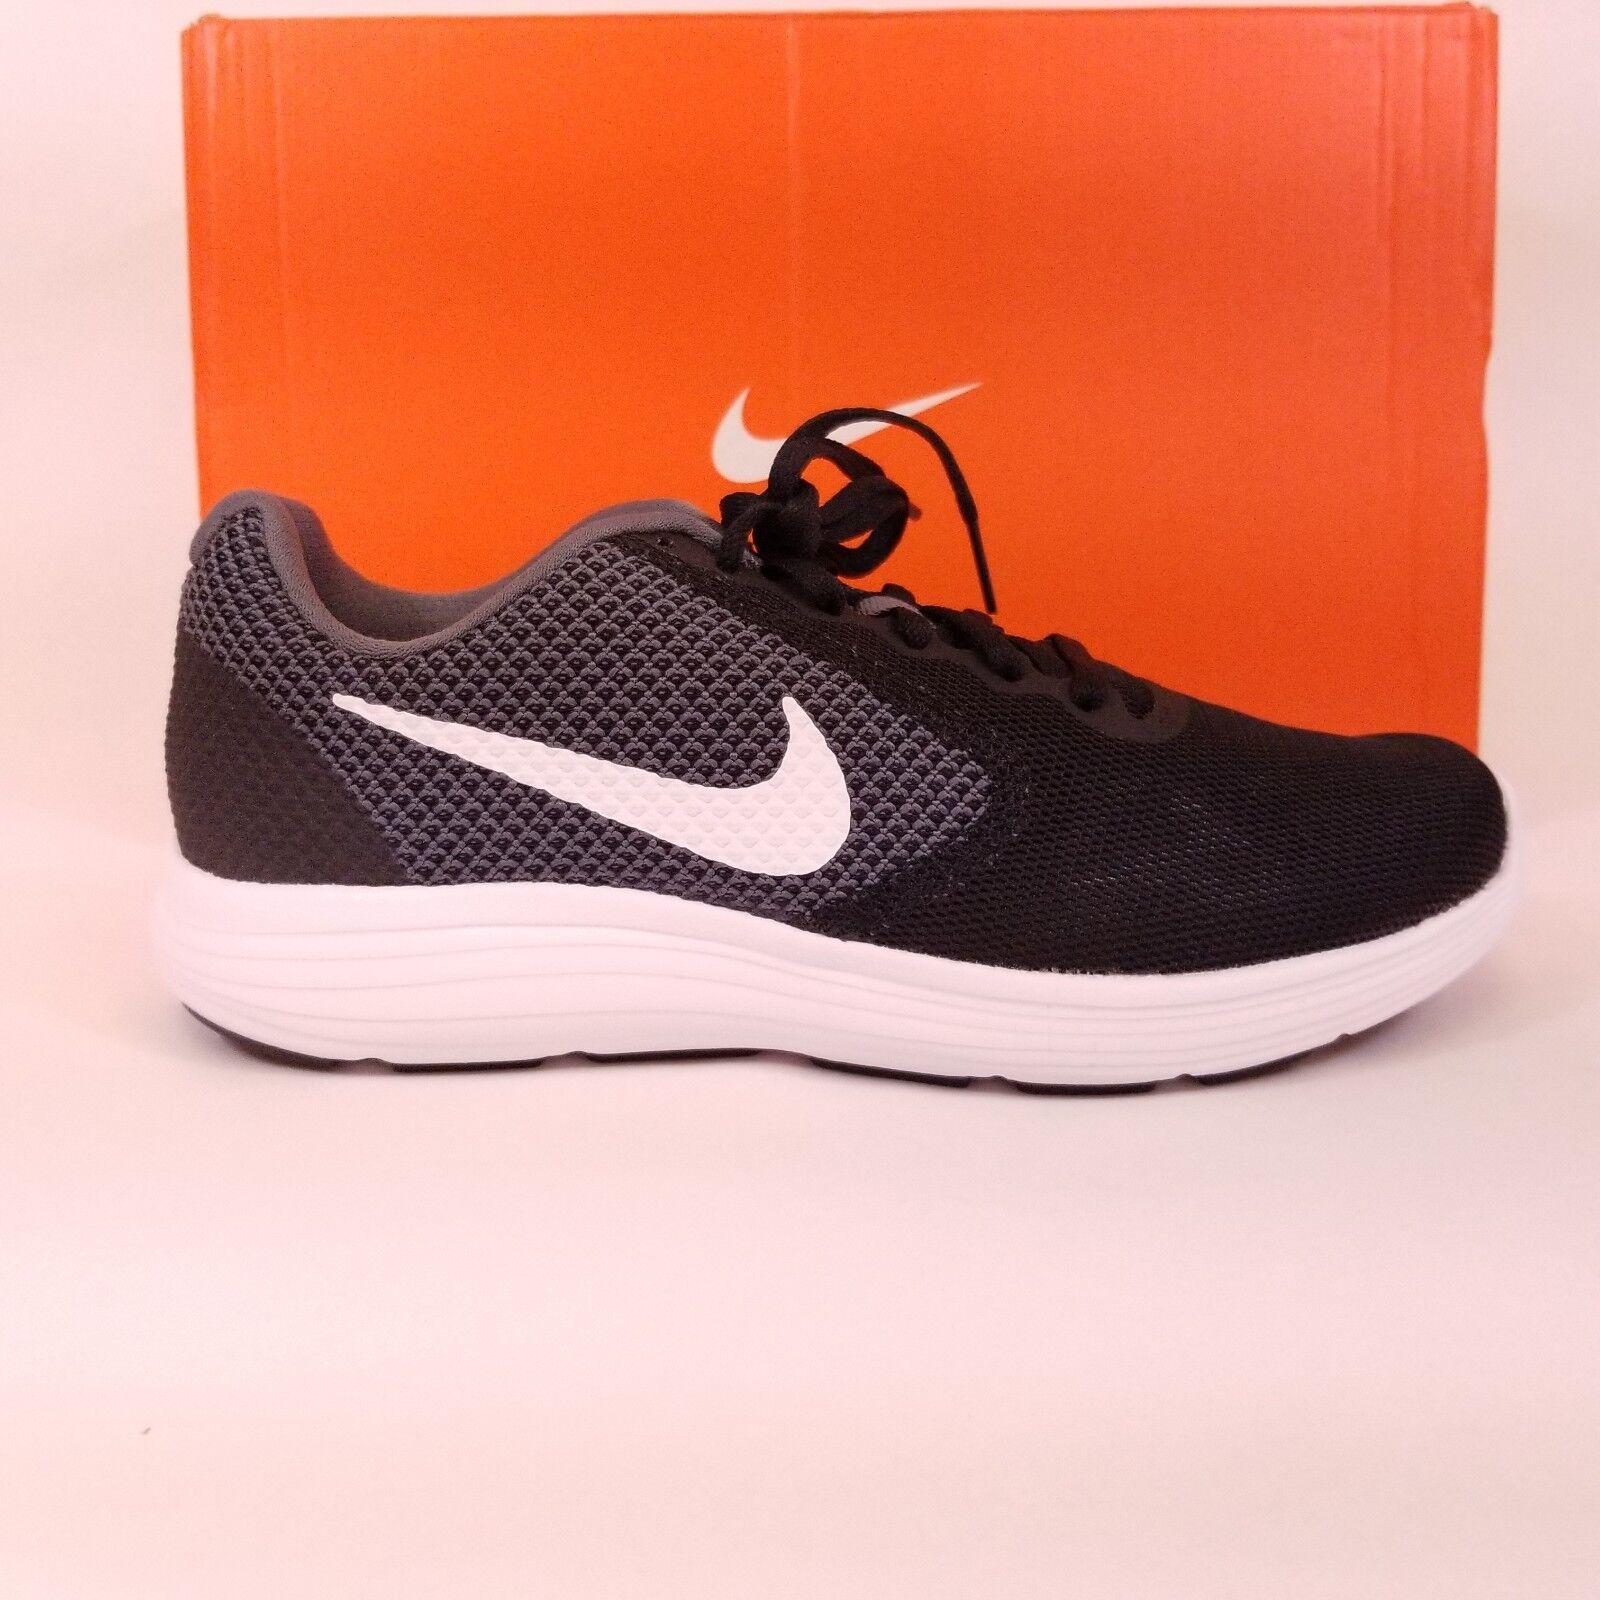 NIKE Men's Revolution 3 Running shoes Black size US 6.5